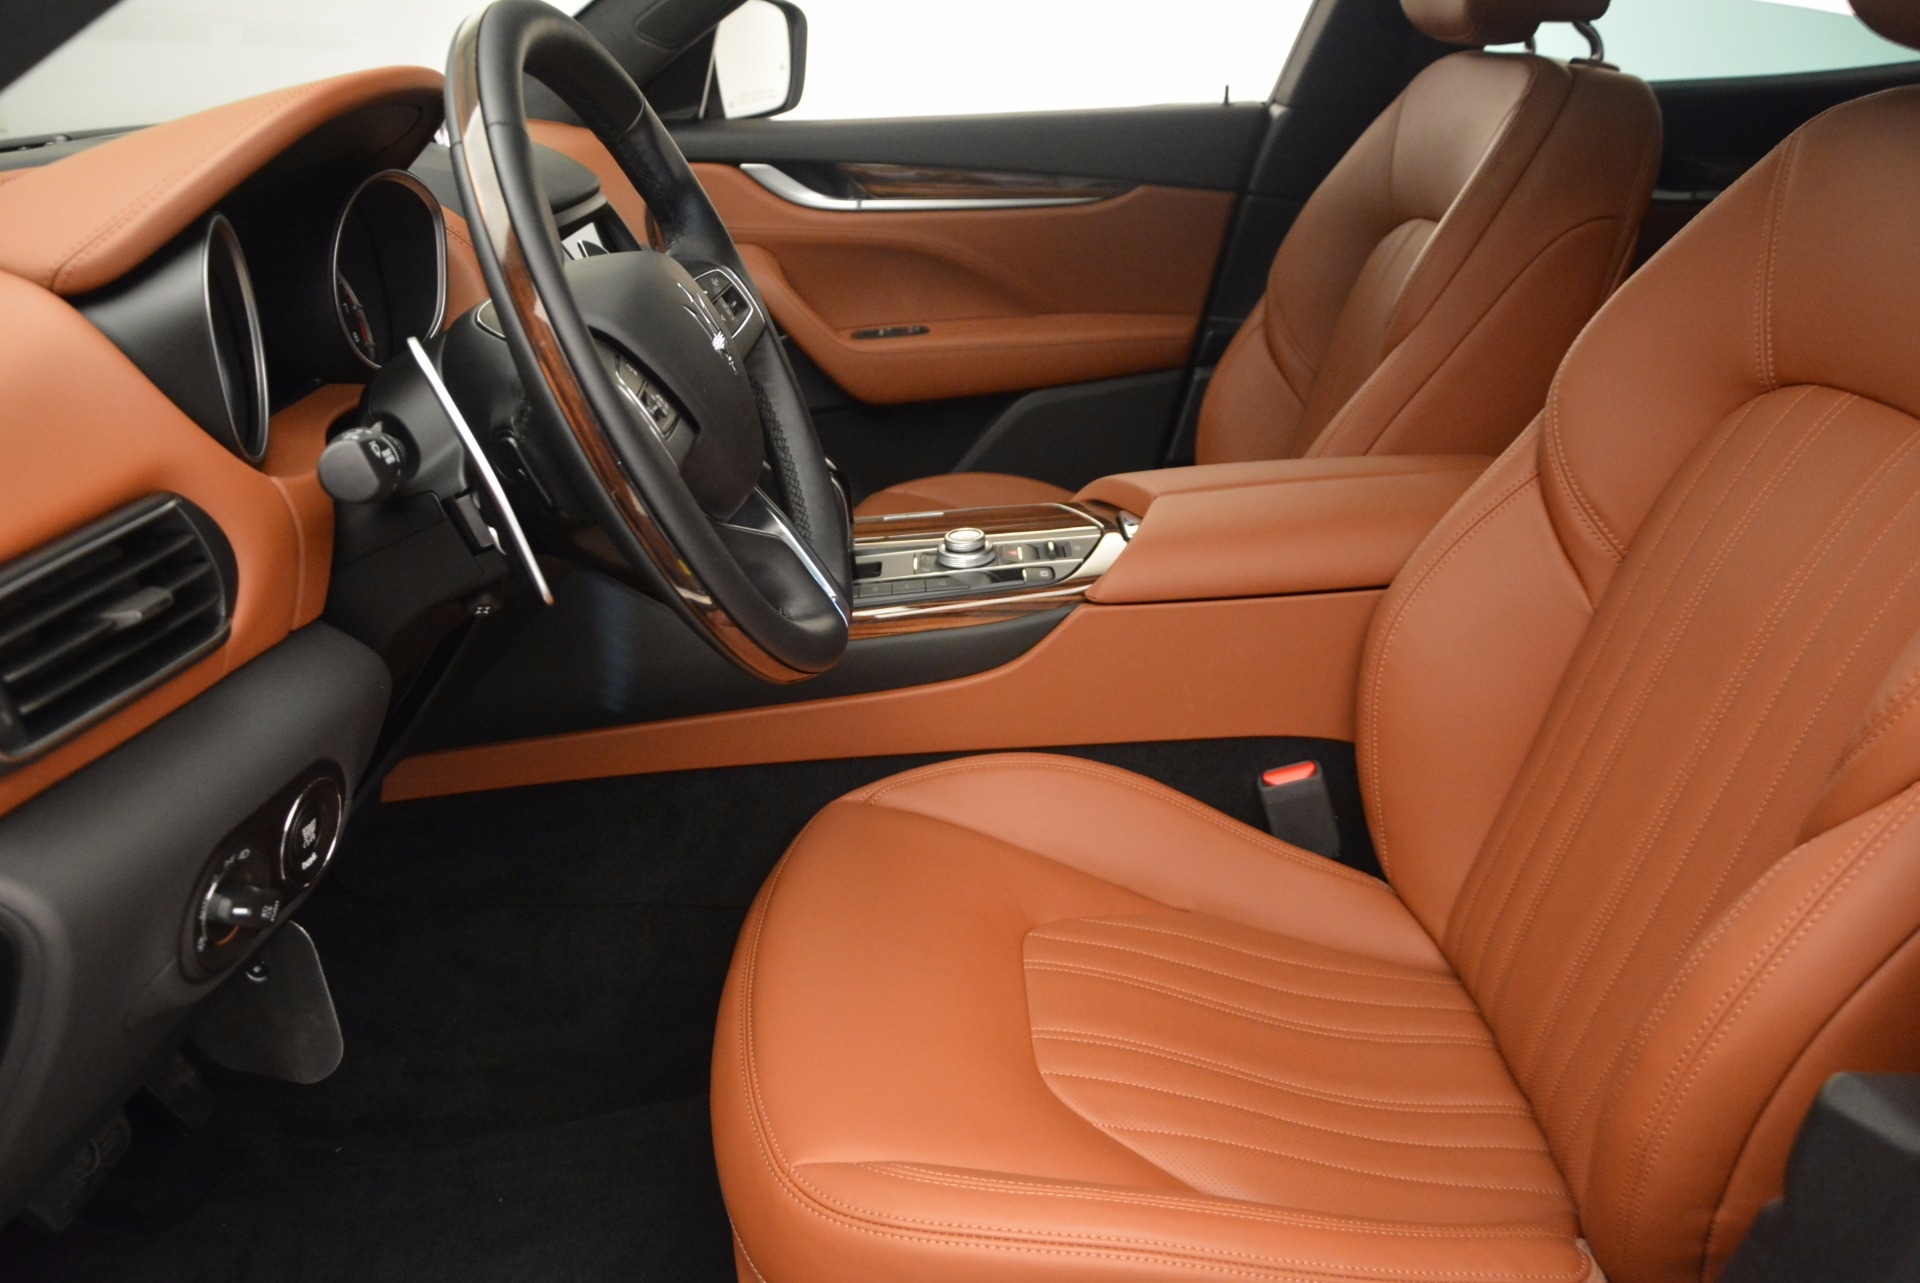 Used 2017 Maserati Levante S For Sale In Westport, CT 752_p20